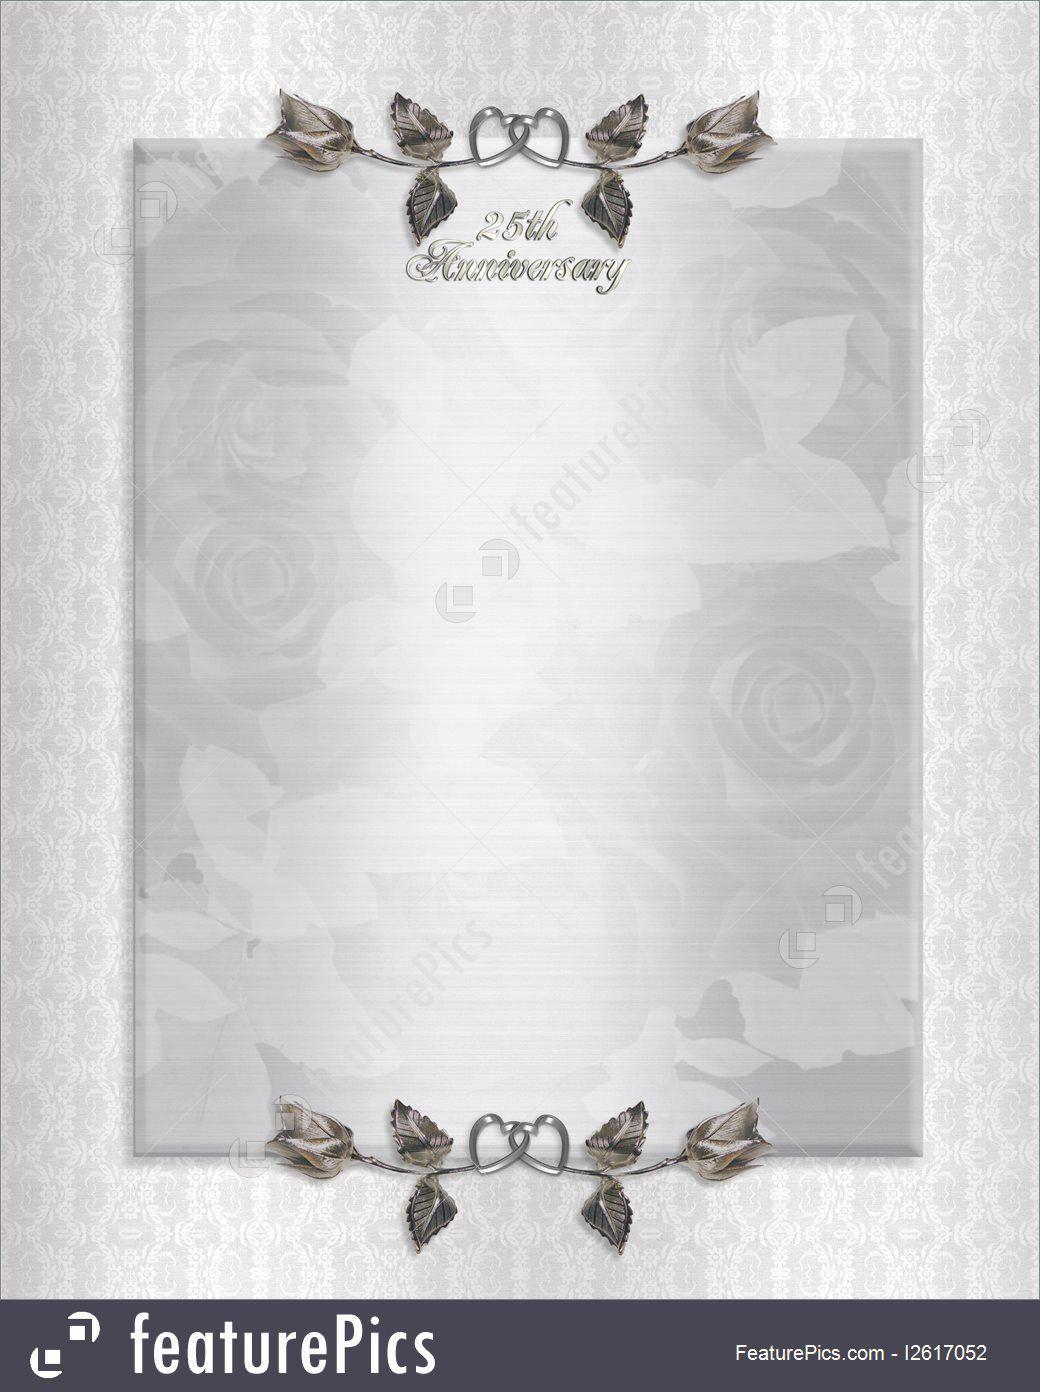 001 Frightening 50th Anniversary Invitation Card Template Inspiration  Templates FreeFull